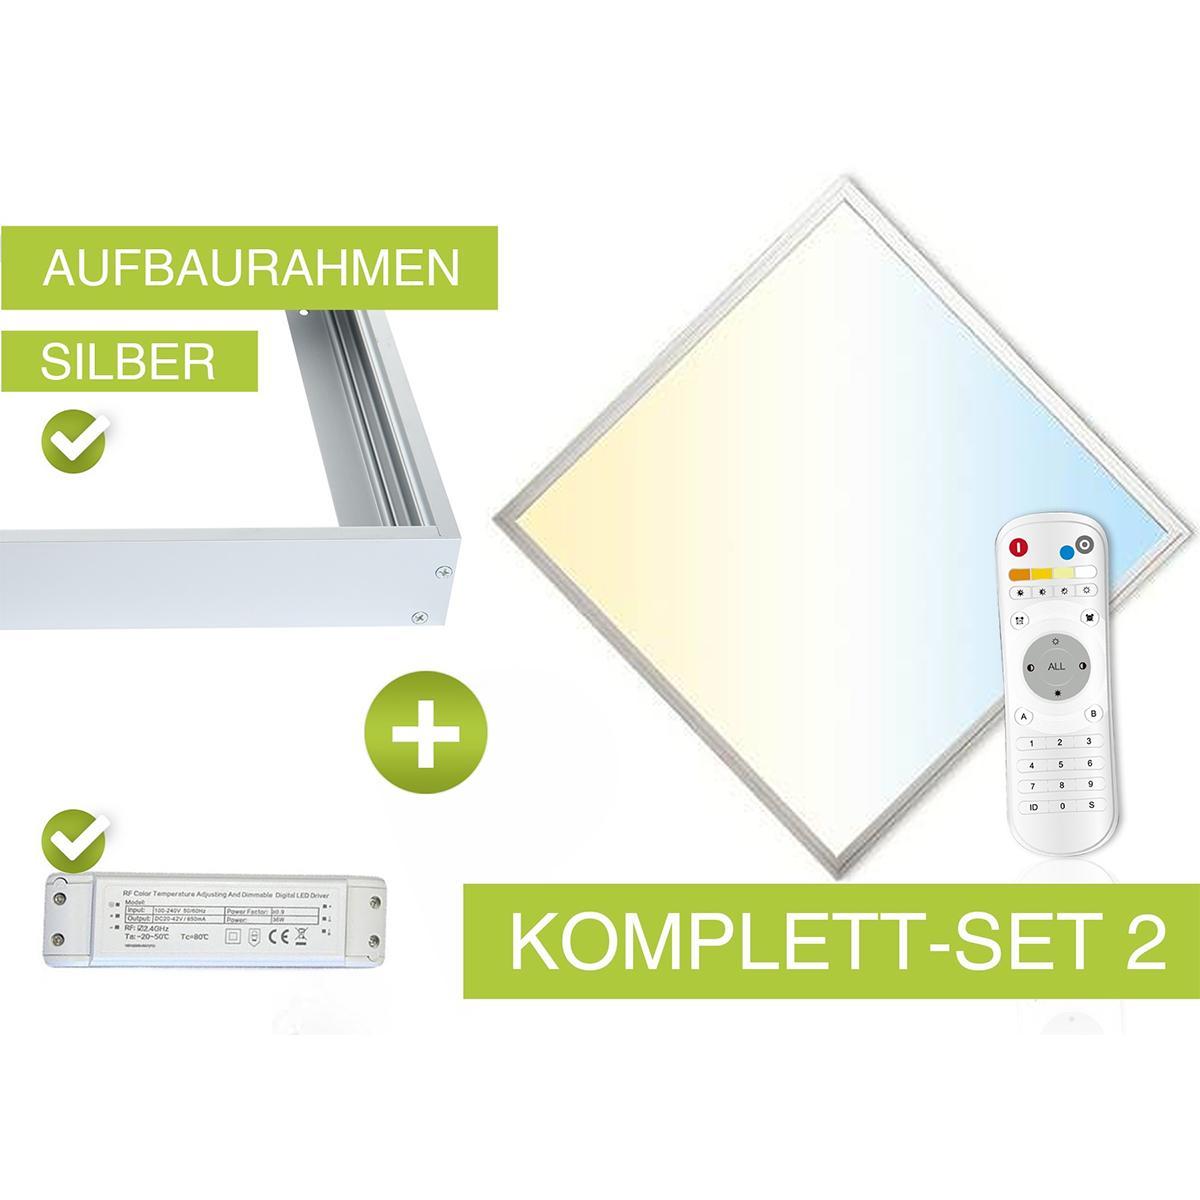 CCT LED Panel Set 62x62cm 36W 3000K-6000K inkl. Aufbau-Rahmen silber, Netzteil und FB